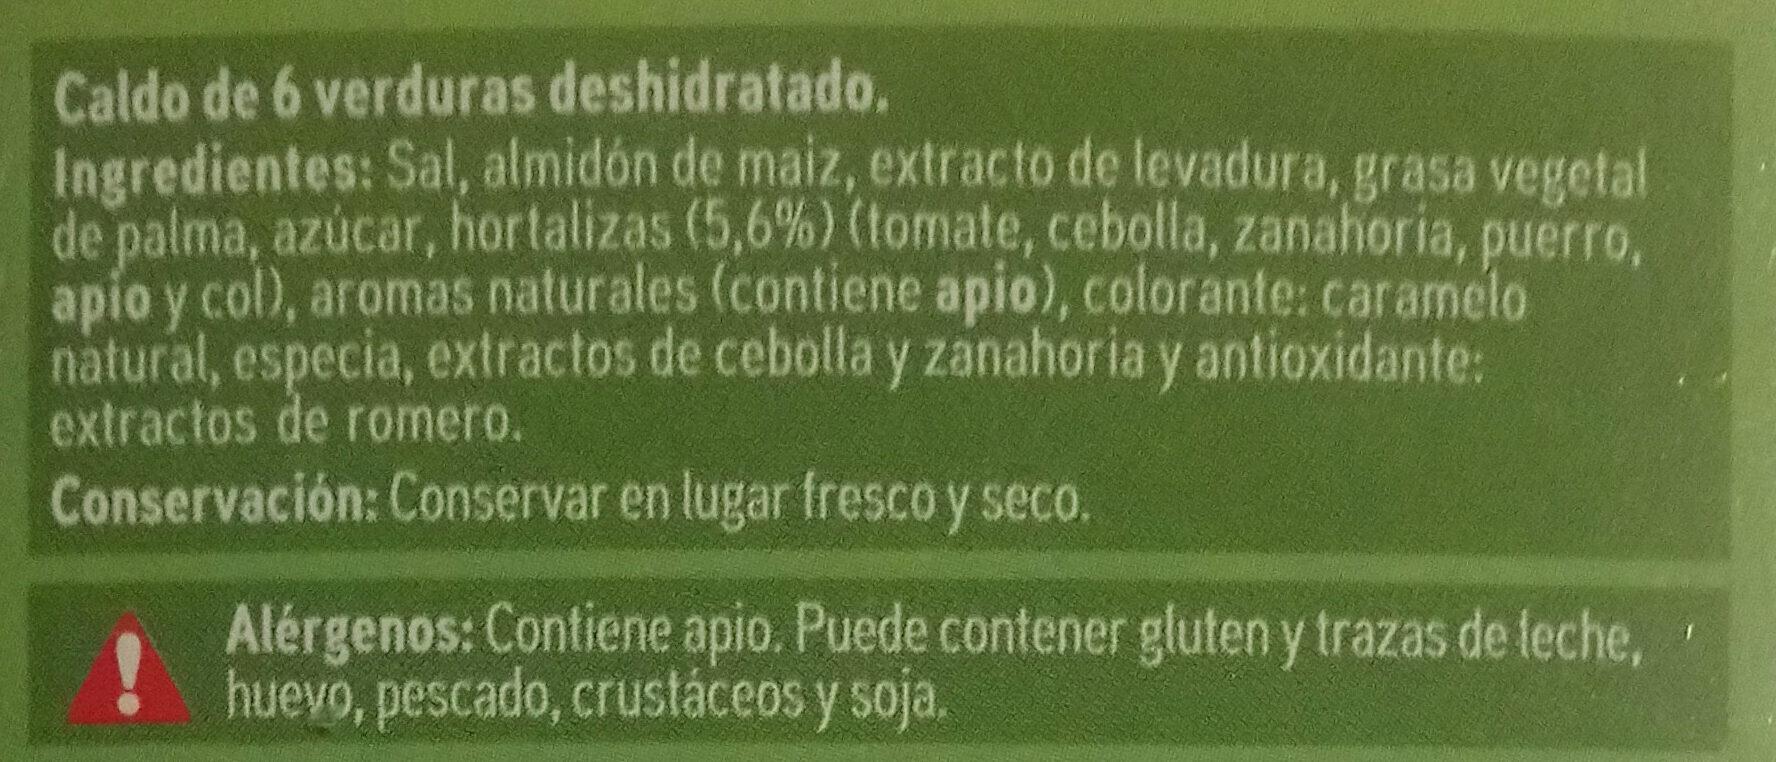 Caldo de verdura - Ingredientes - es